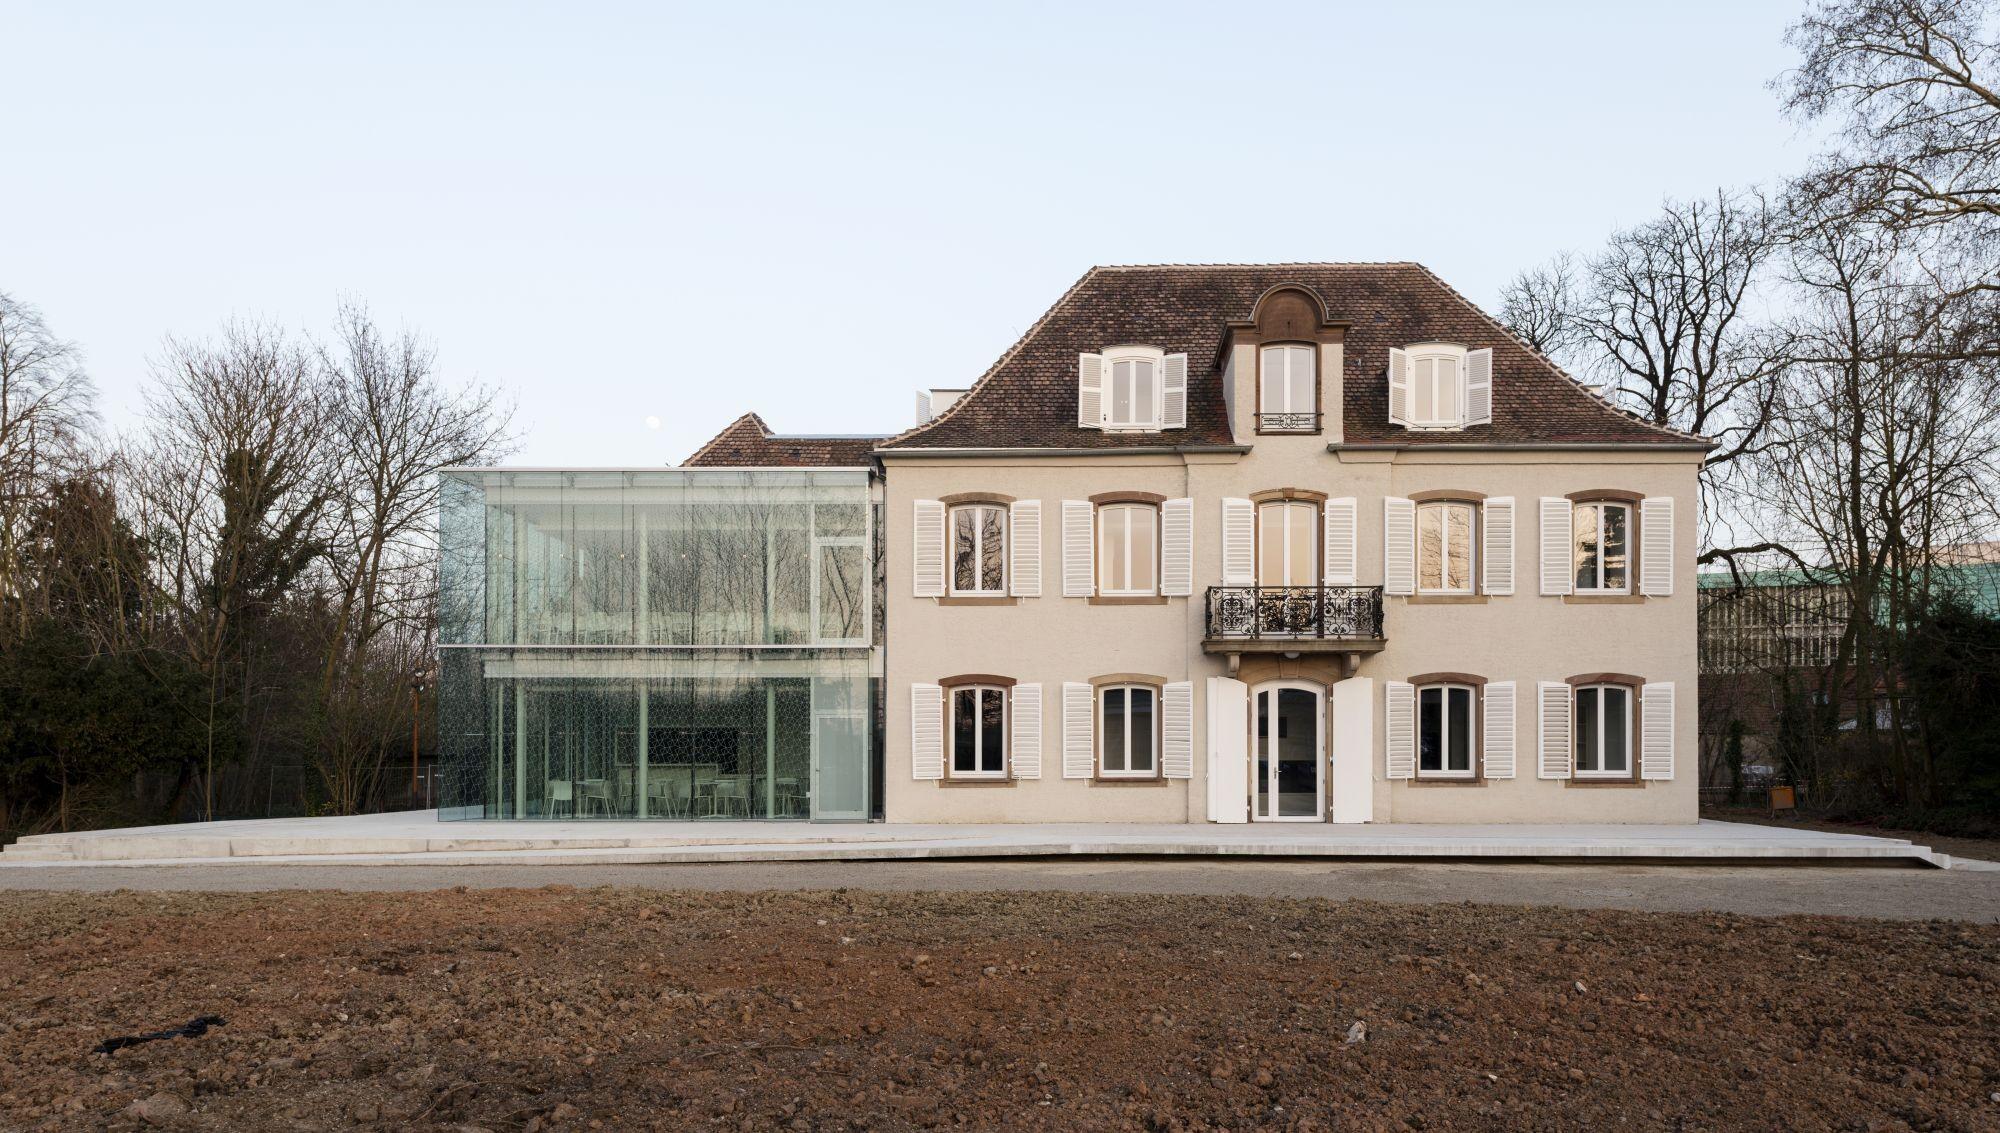 The Kayserguet Villa a Space of Europeanness / Weber + Keiling + IOWE Architectures, © Florian TJEDJE